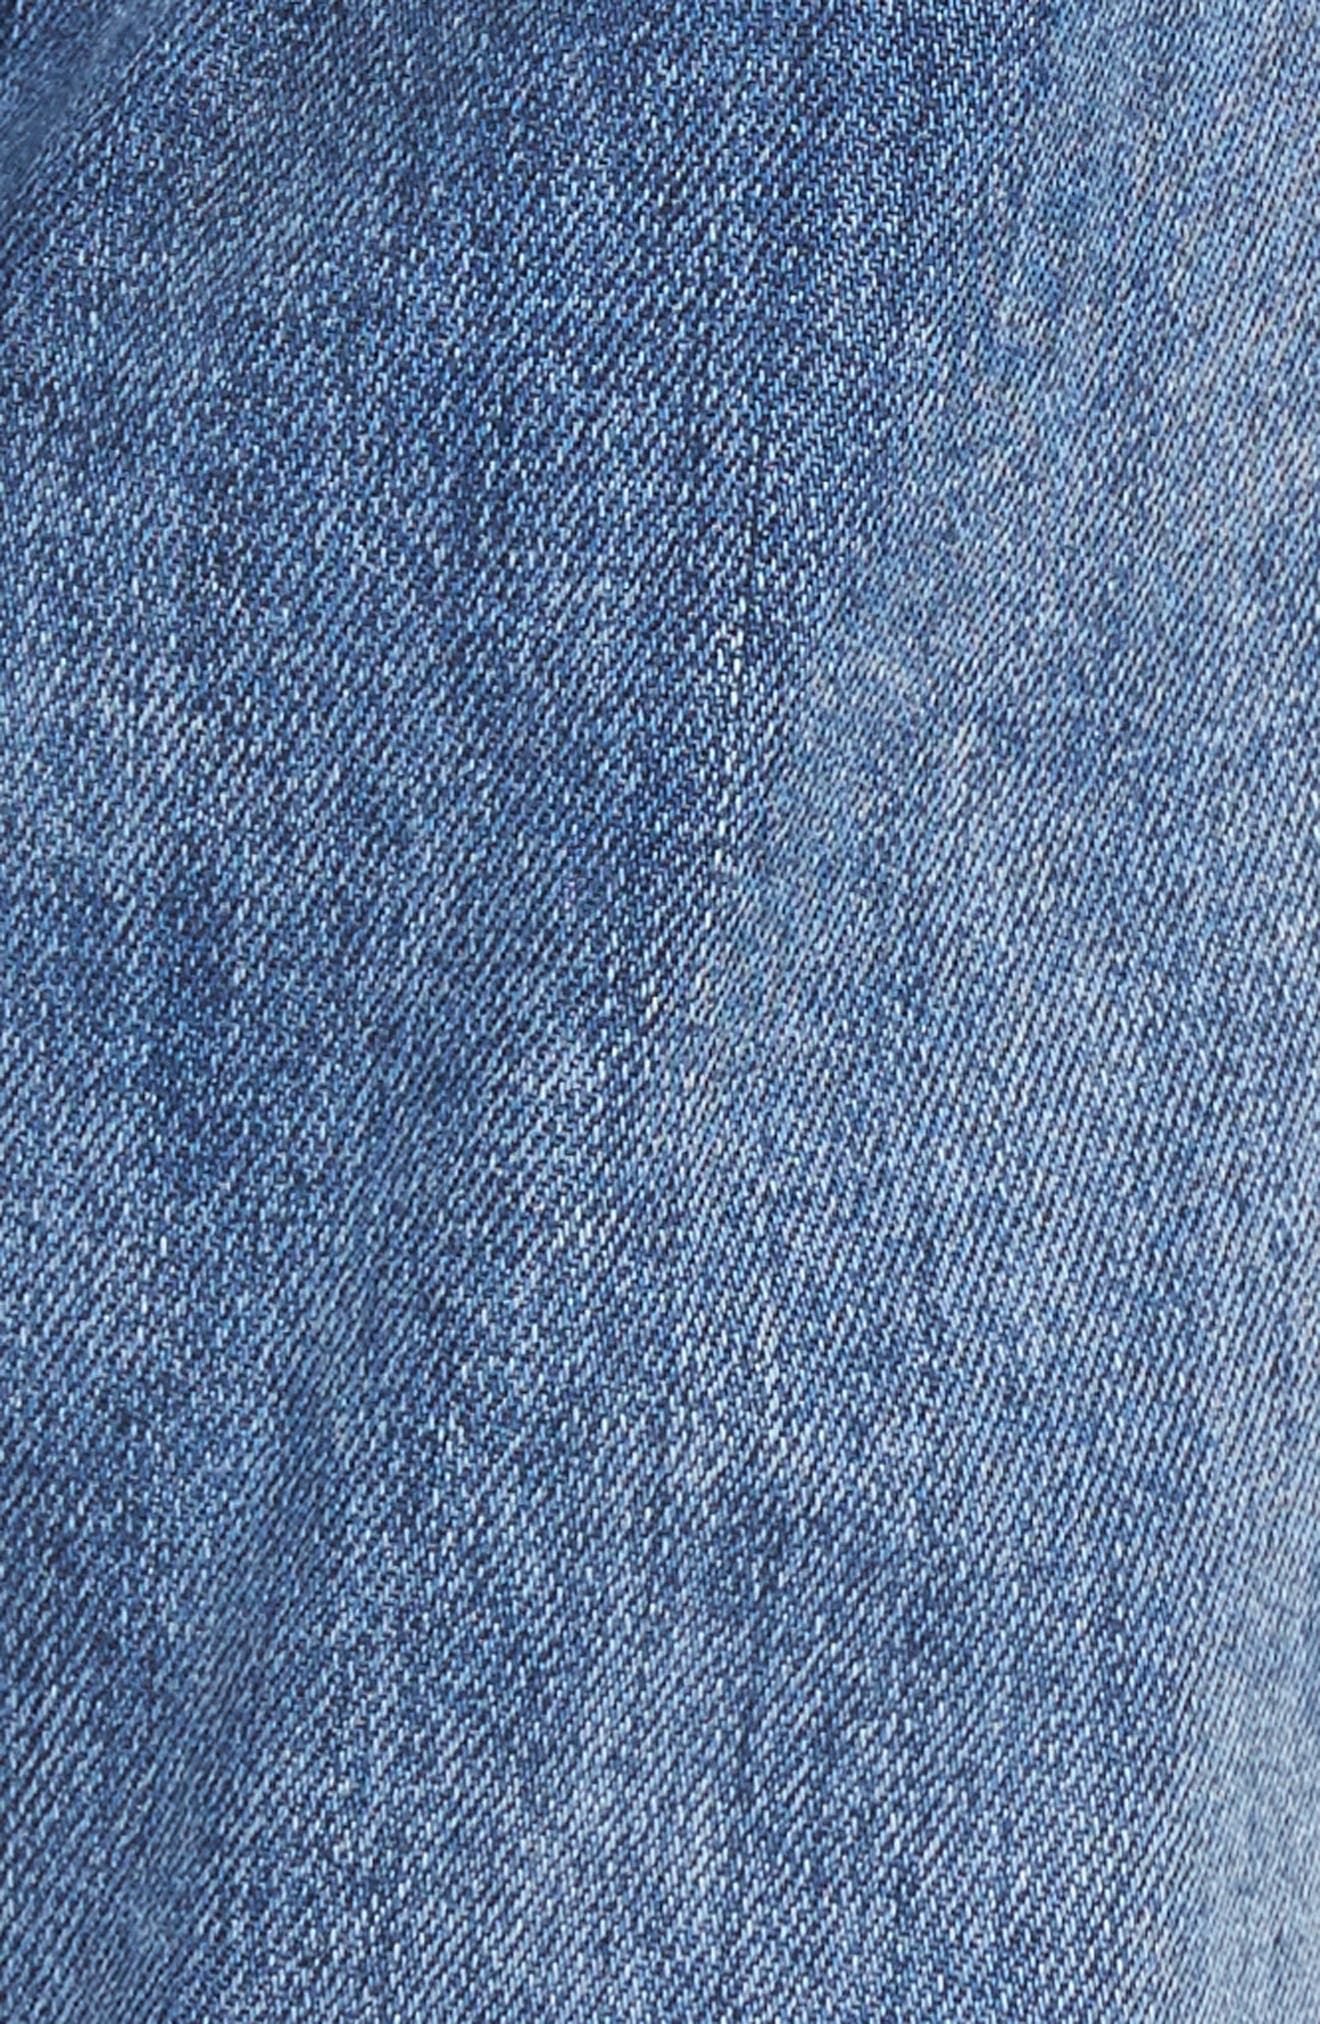 Tuckers High Waist Straight Leg Jeans,                             Alternate thumbnail 5, color,